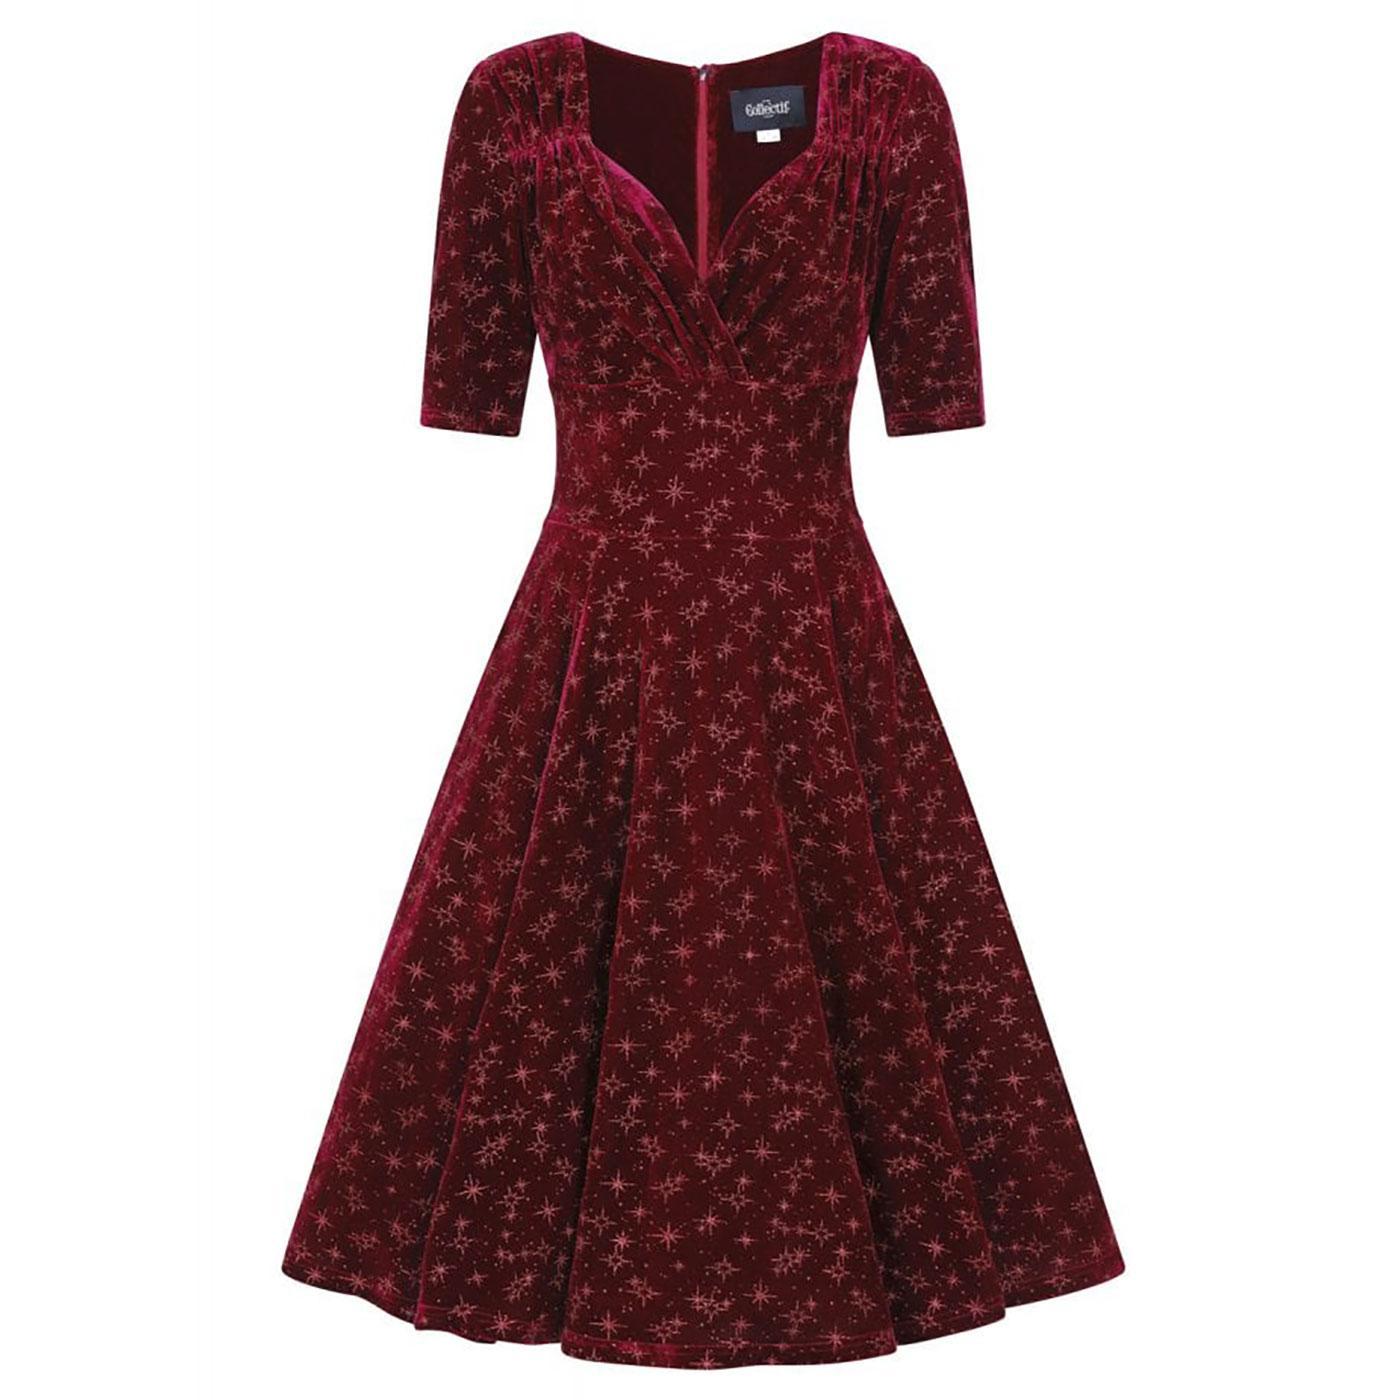 Trixie Velvet COLLECTIF Retro Vintage Doll Dress W